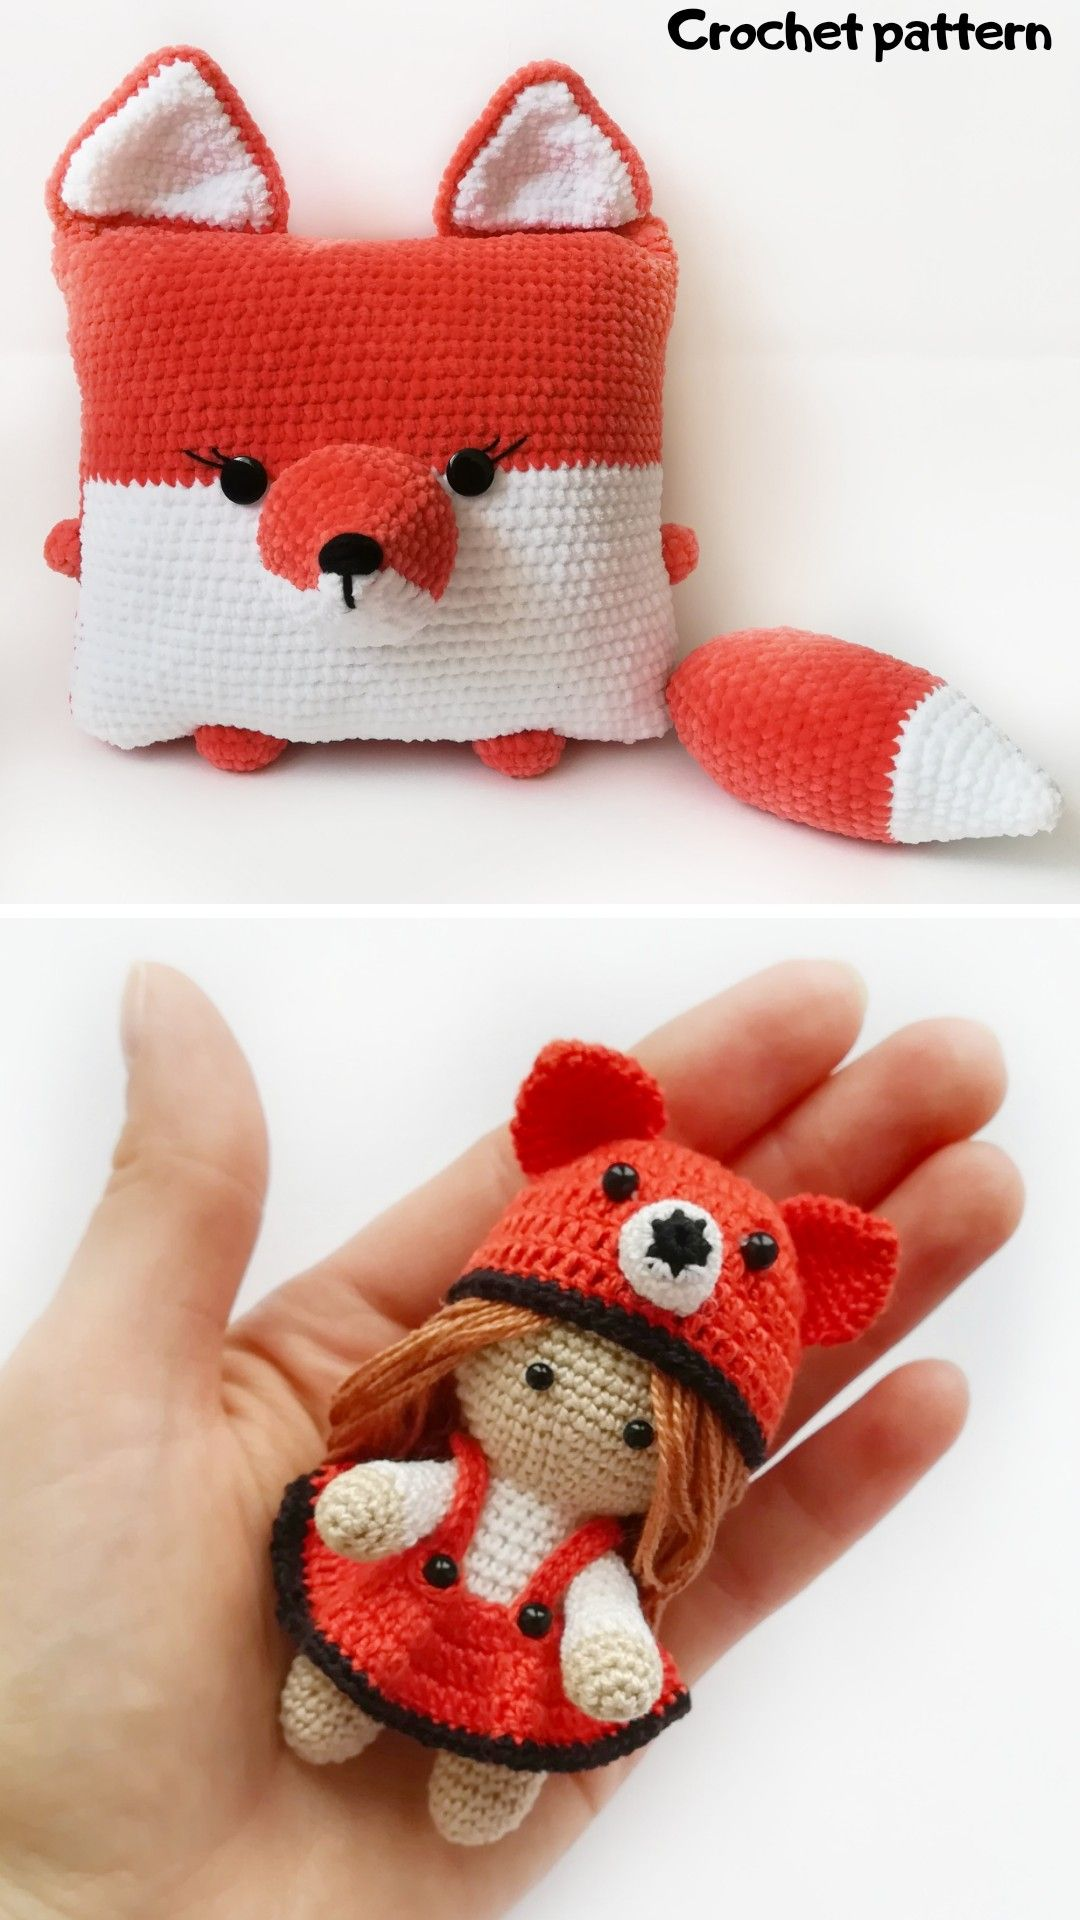 Crochet pattern doll, crochet tutorial, crochet fox pattern, amigurumi toys pattern, crochet pillow